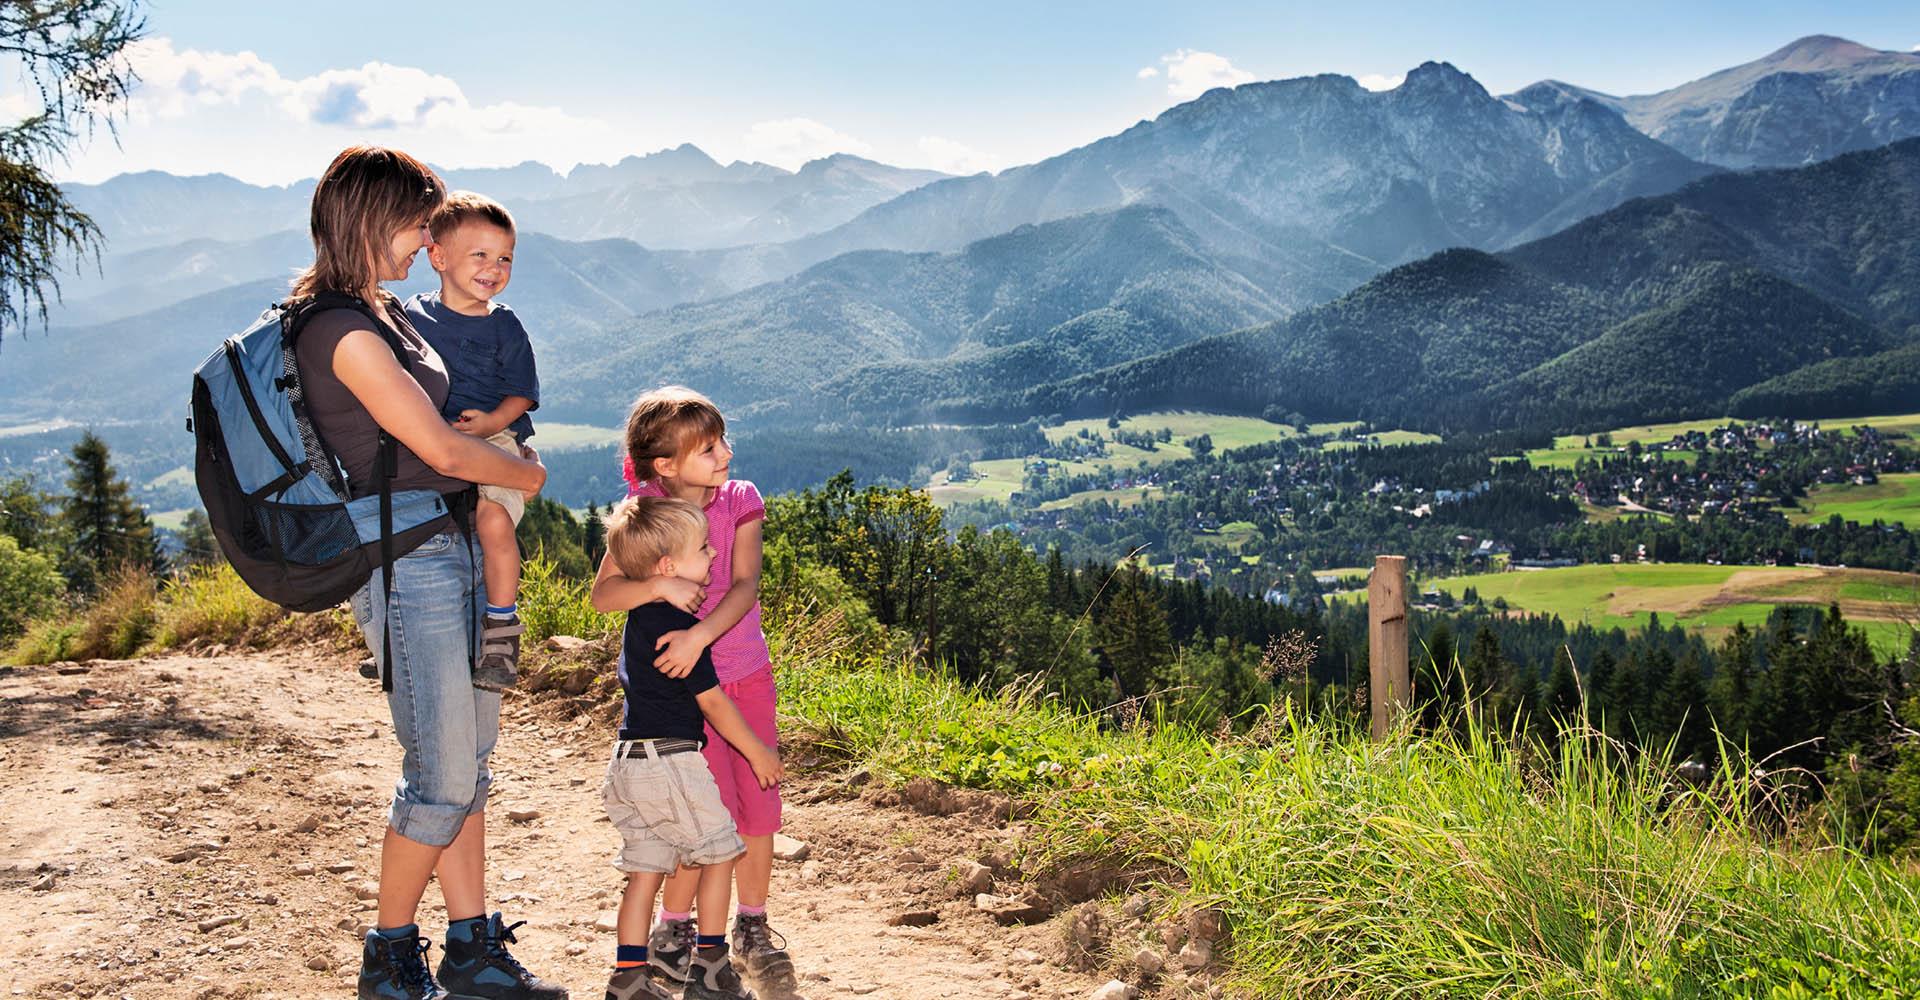 Familienurlaub All inclusive in Wagrain / Kleinarl - Hotel Wagrainerhof